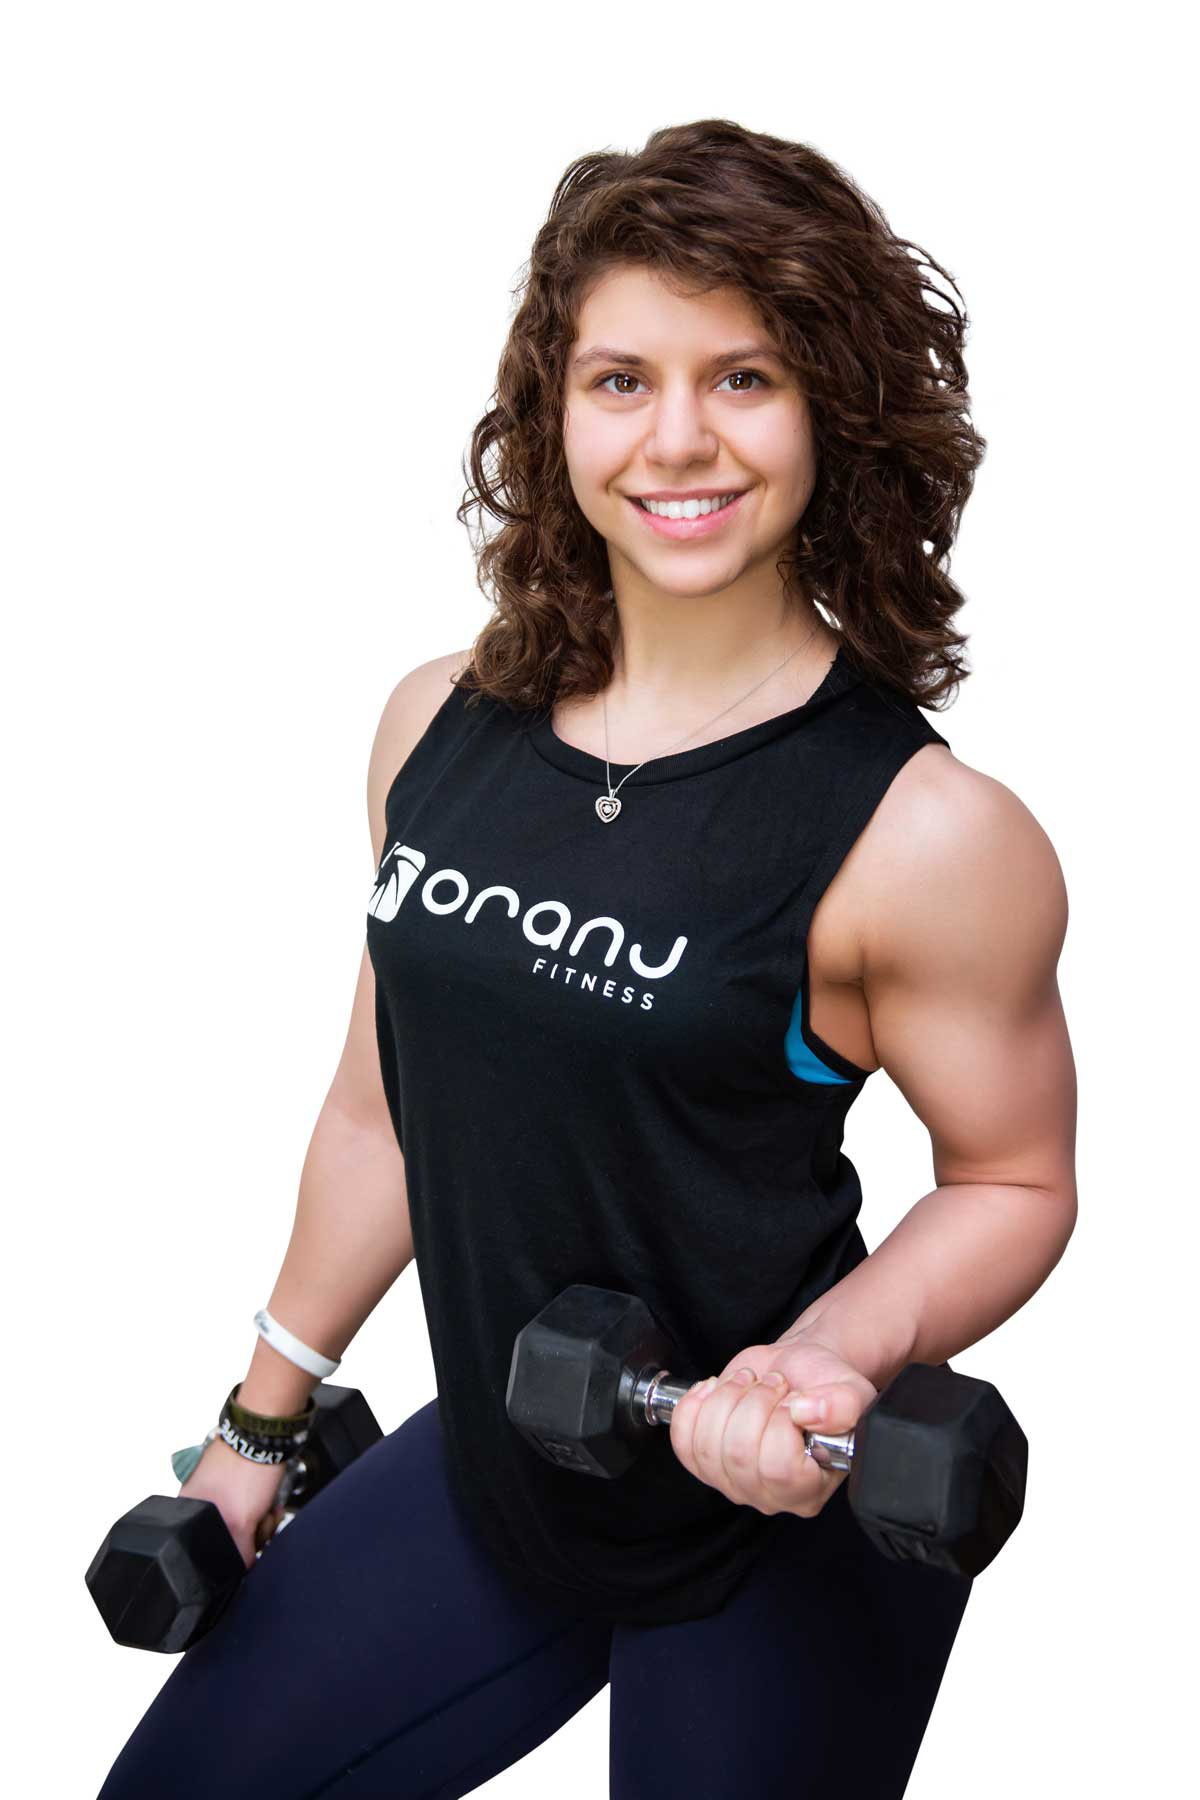 Alex-Oranj-Fitness